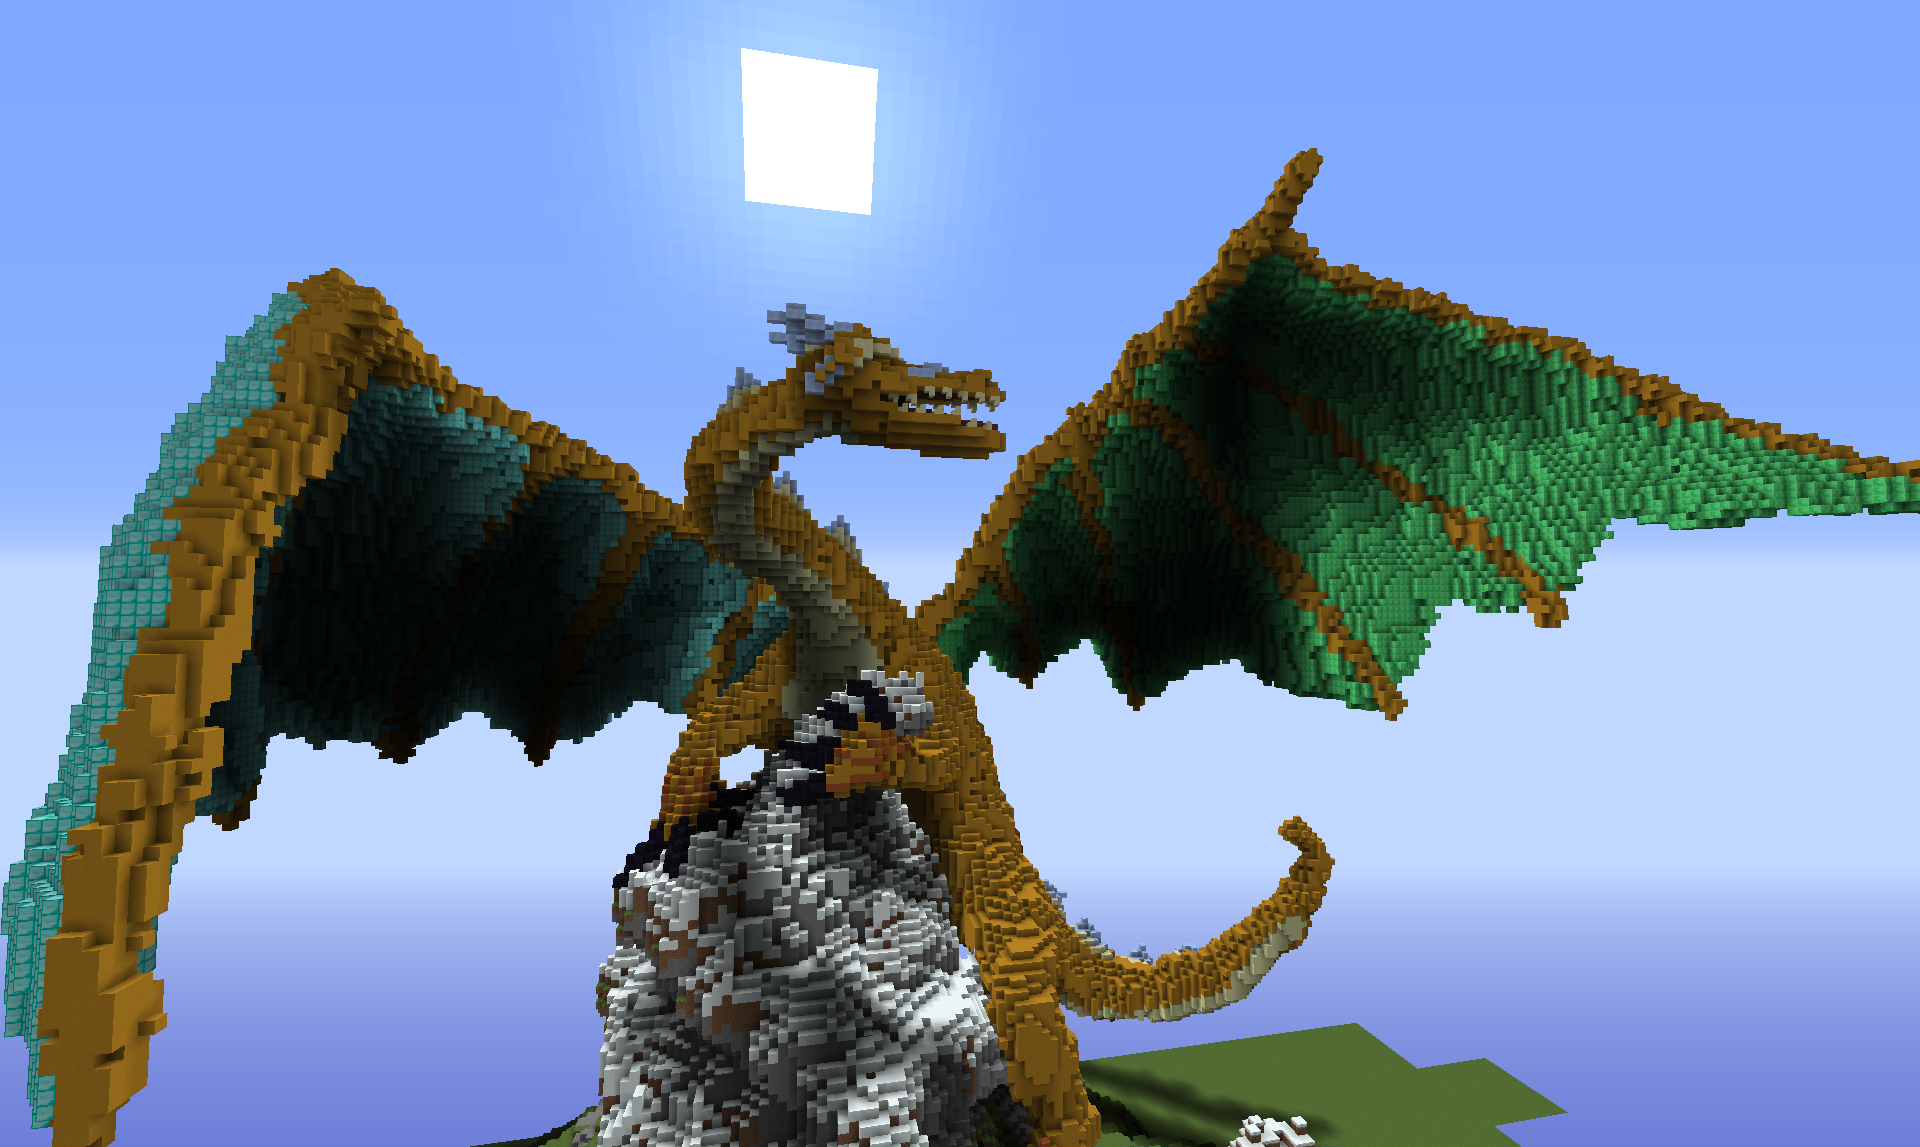 massive minecraft dragon build - Google Search | For the Kids ...